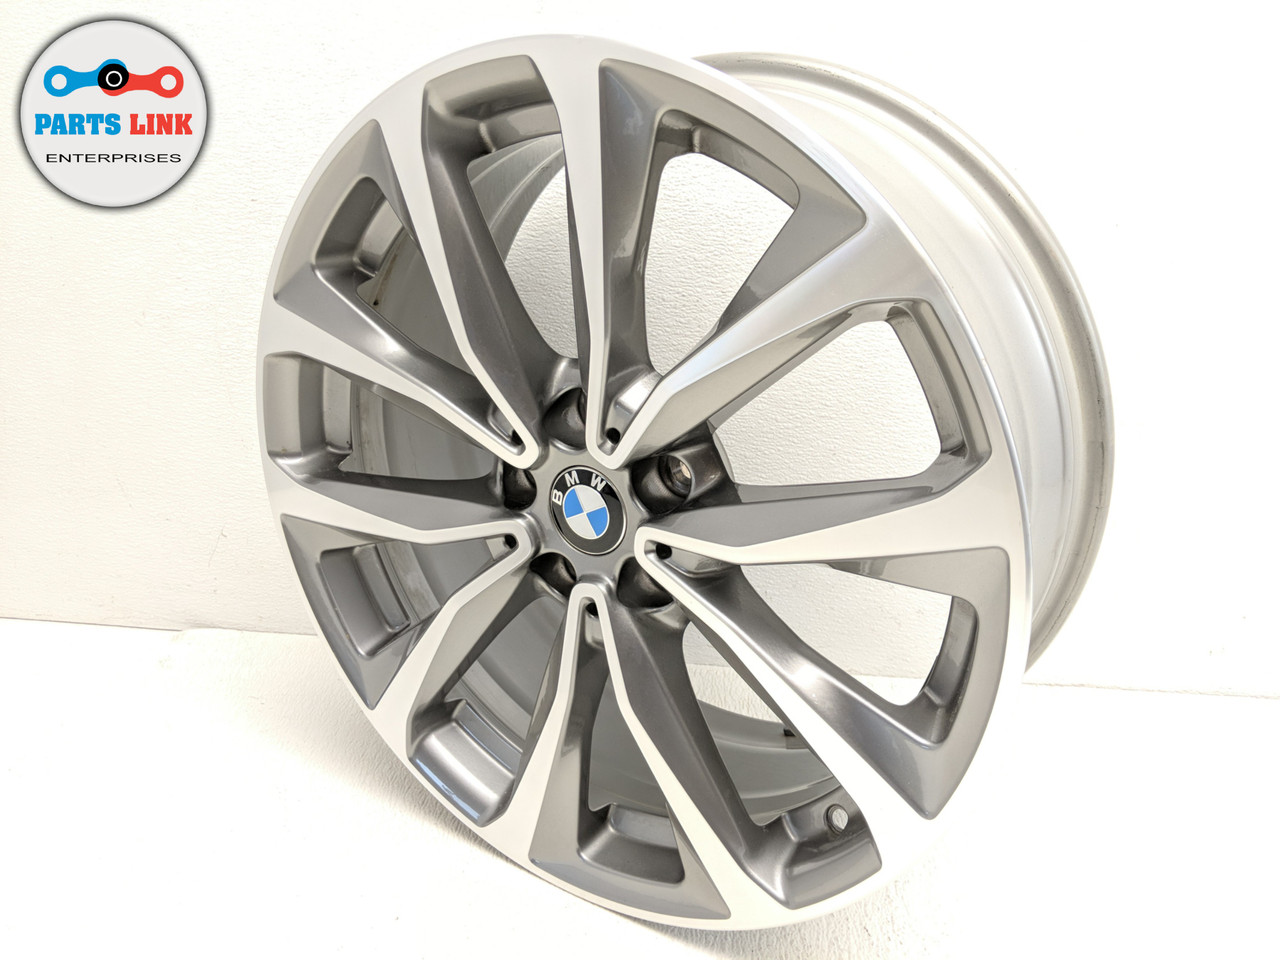 2018 2019 Bmw X3 G01 Wheel 19 X J7 5 Inch 692 Style 10 5 V Spoke Alloy Rim Cap Parts Link Ent